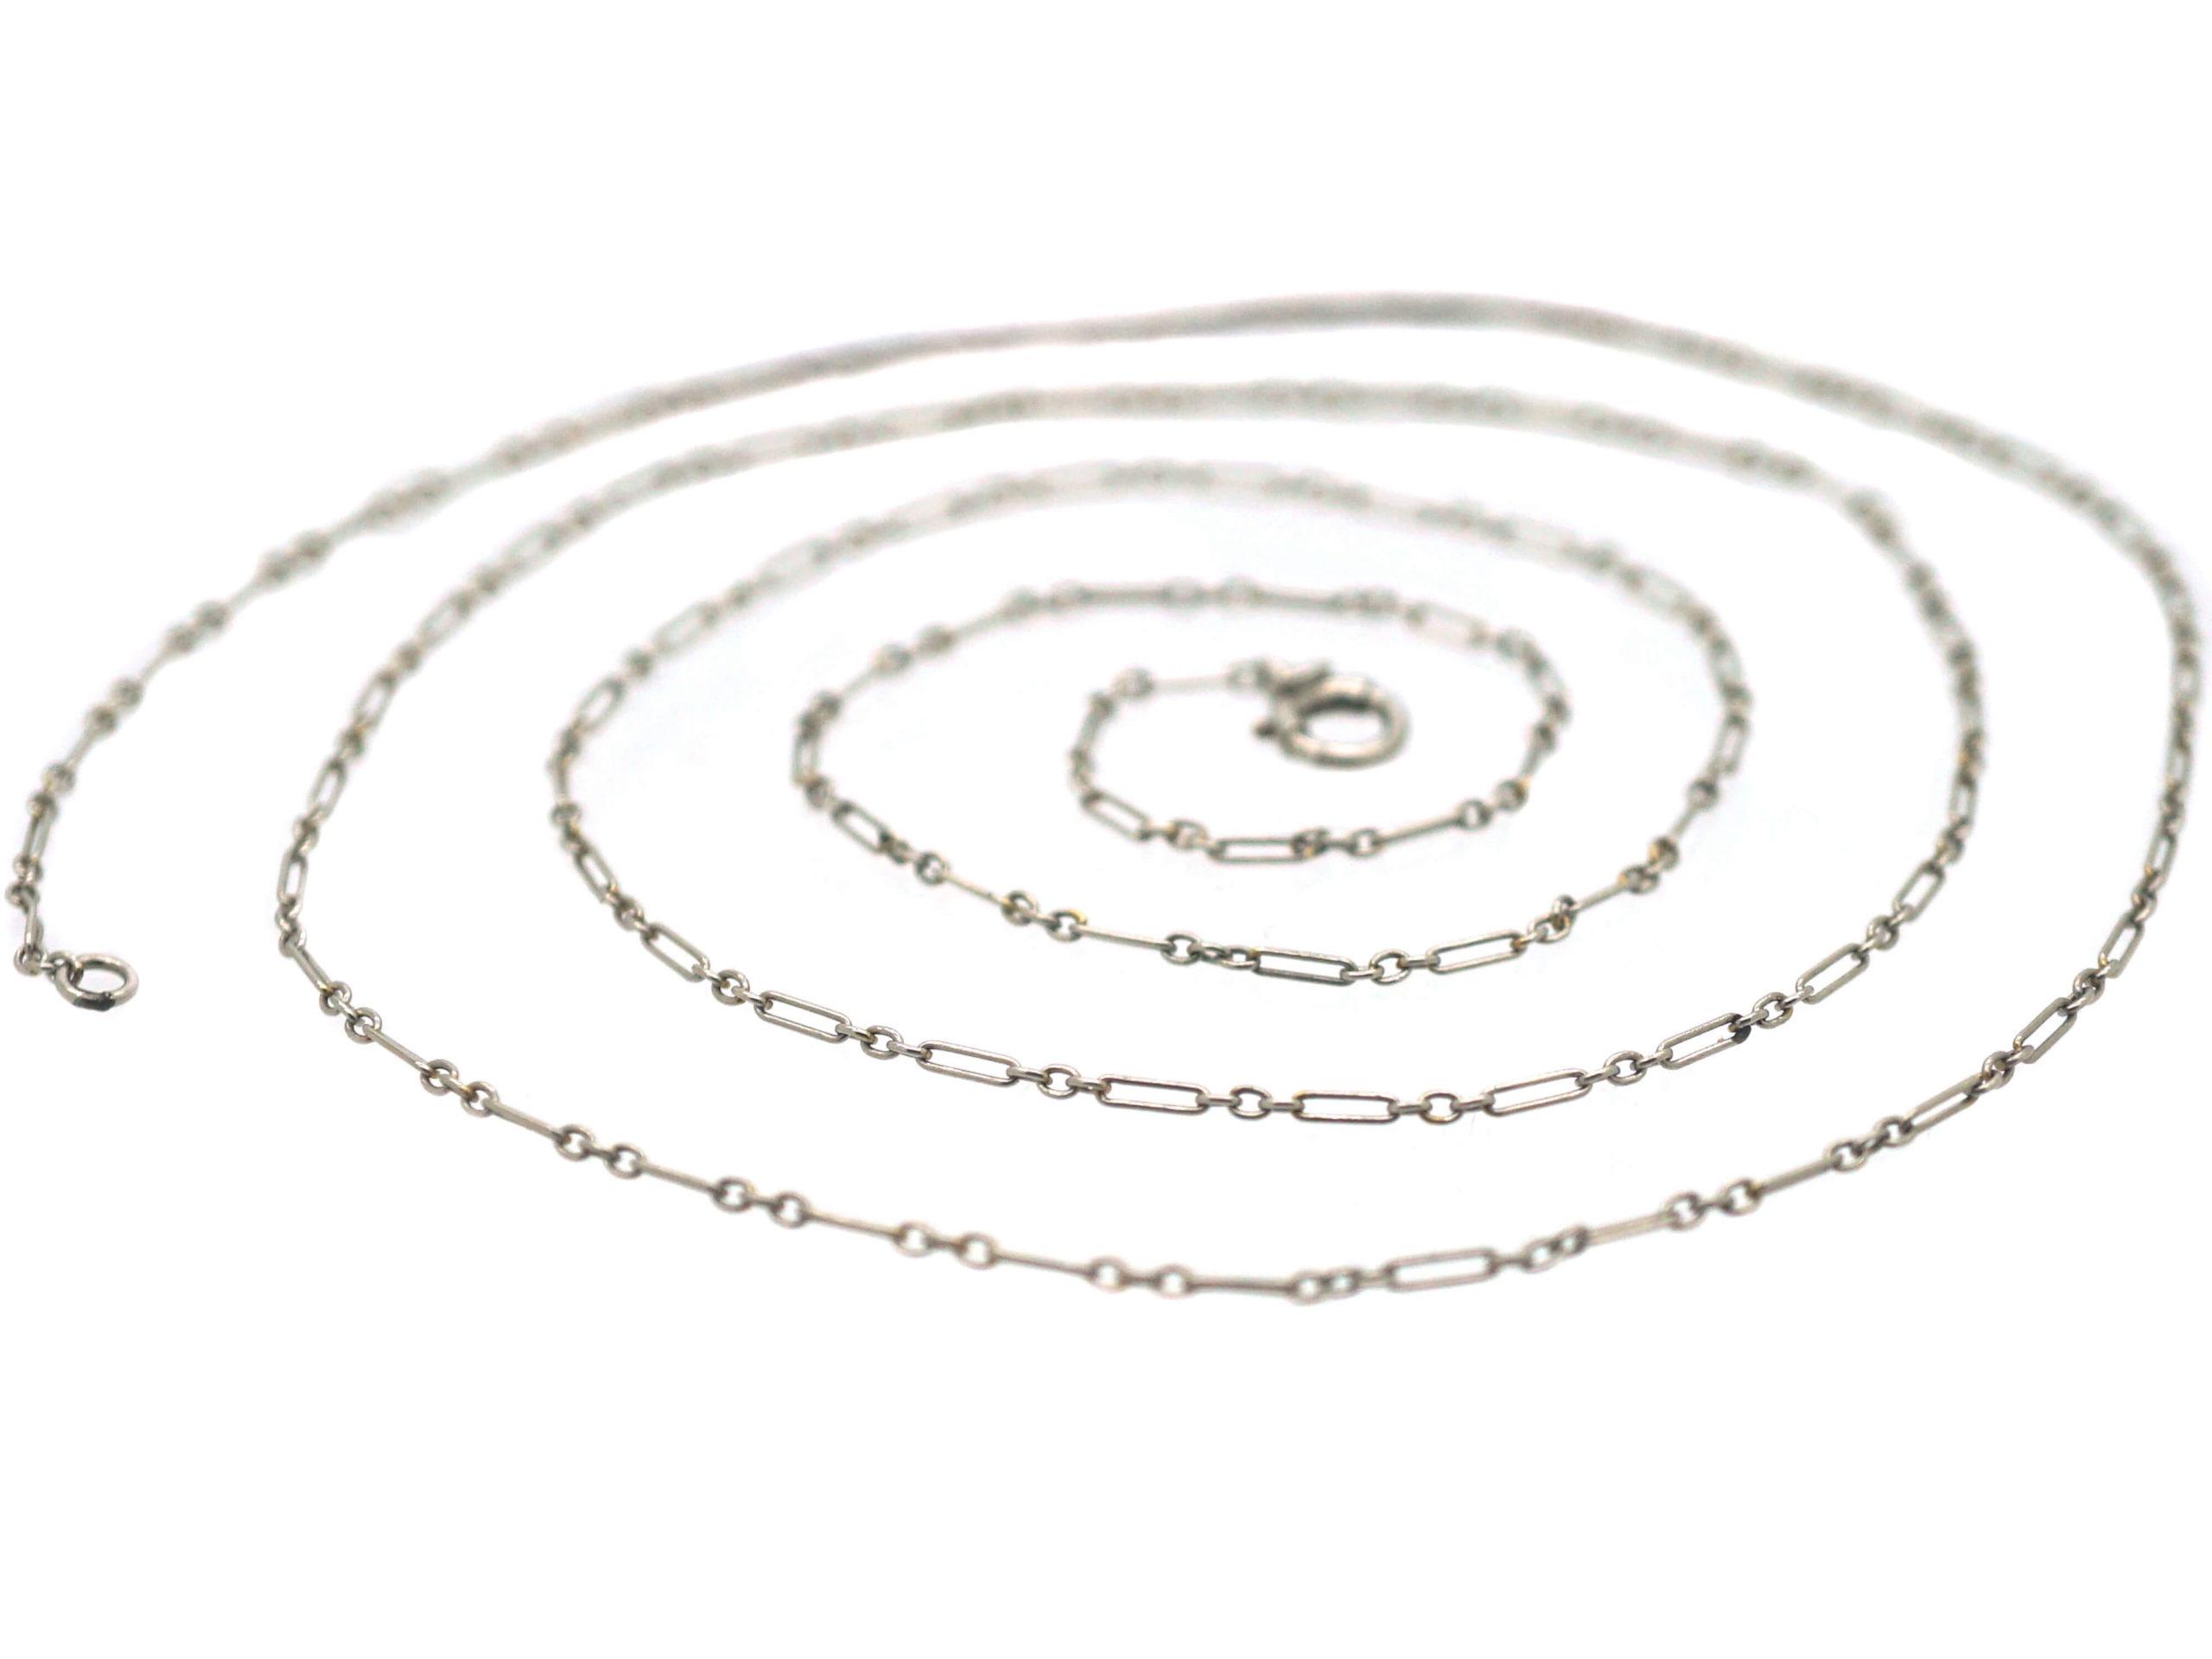 Edwardian Long Platinum Chain